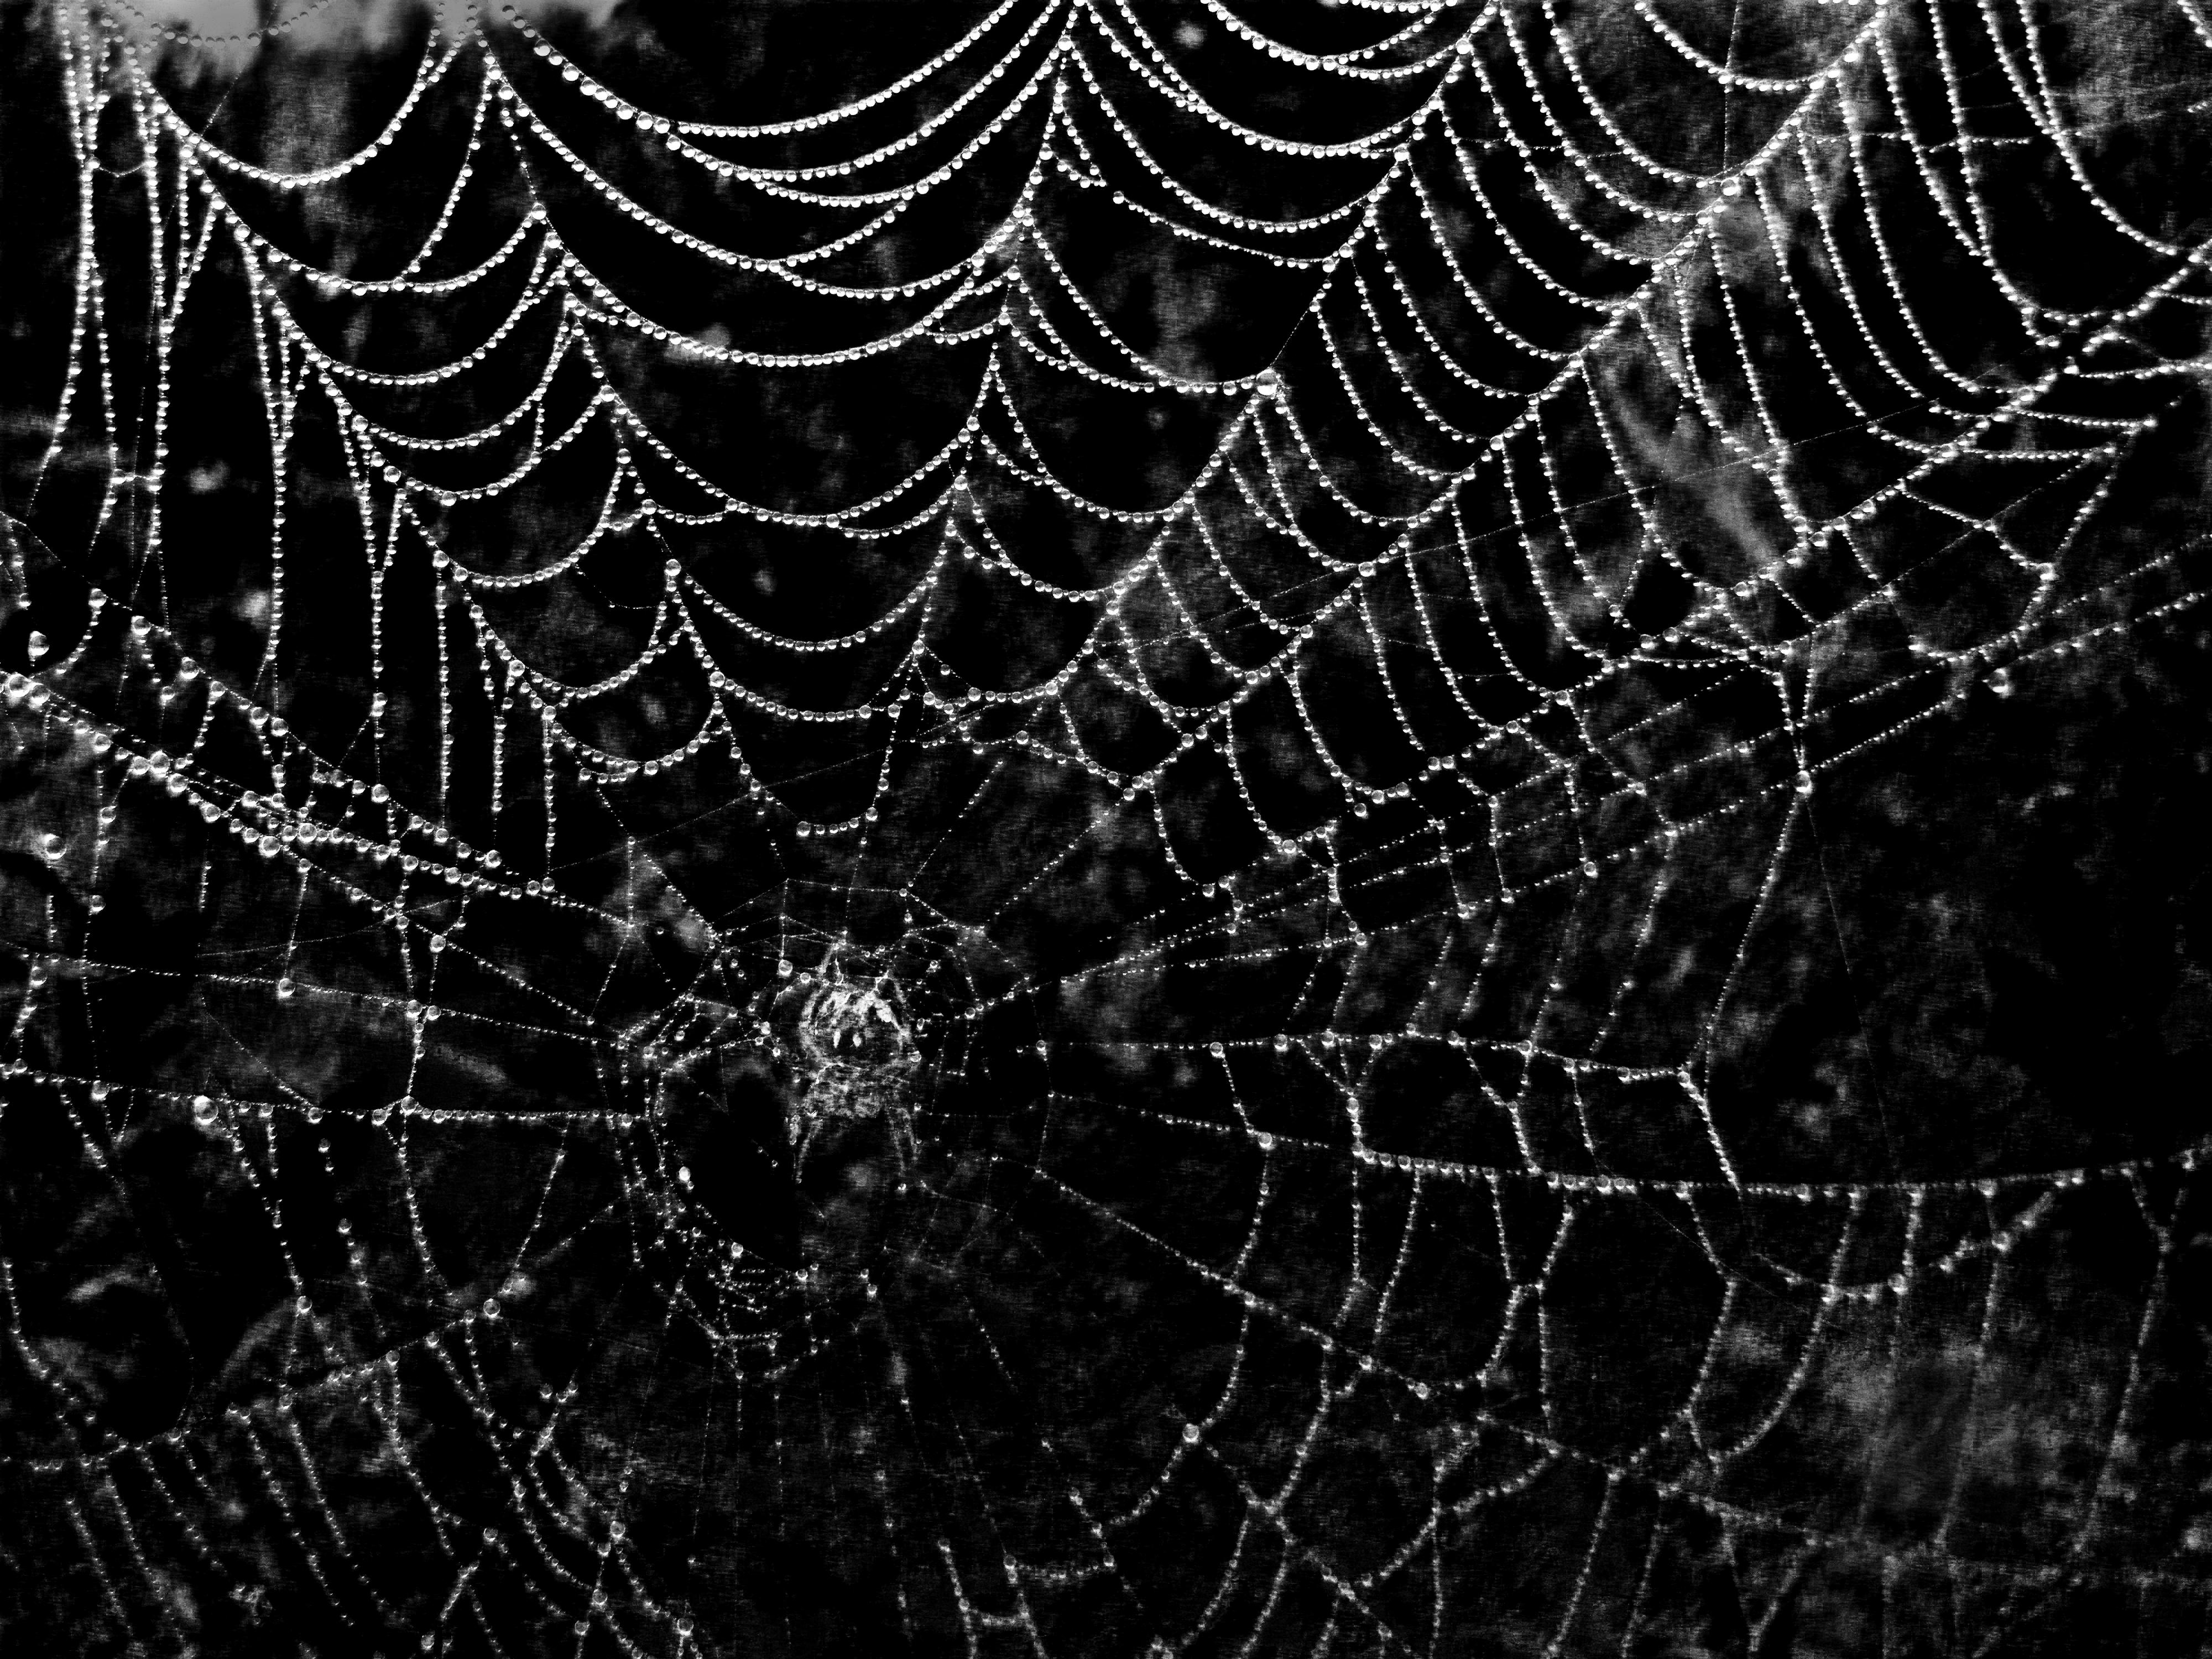 Spider Web Background Images TheCelebrityPix 4000x3000